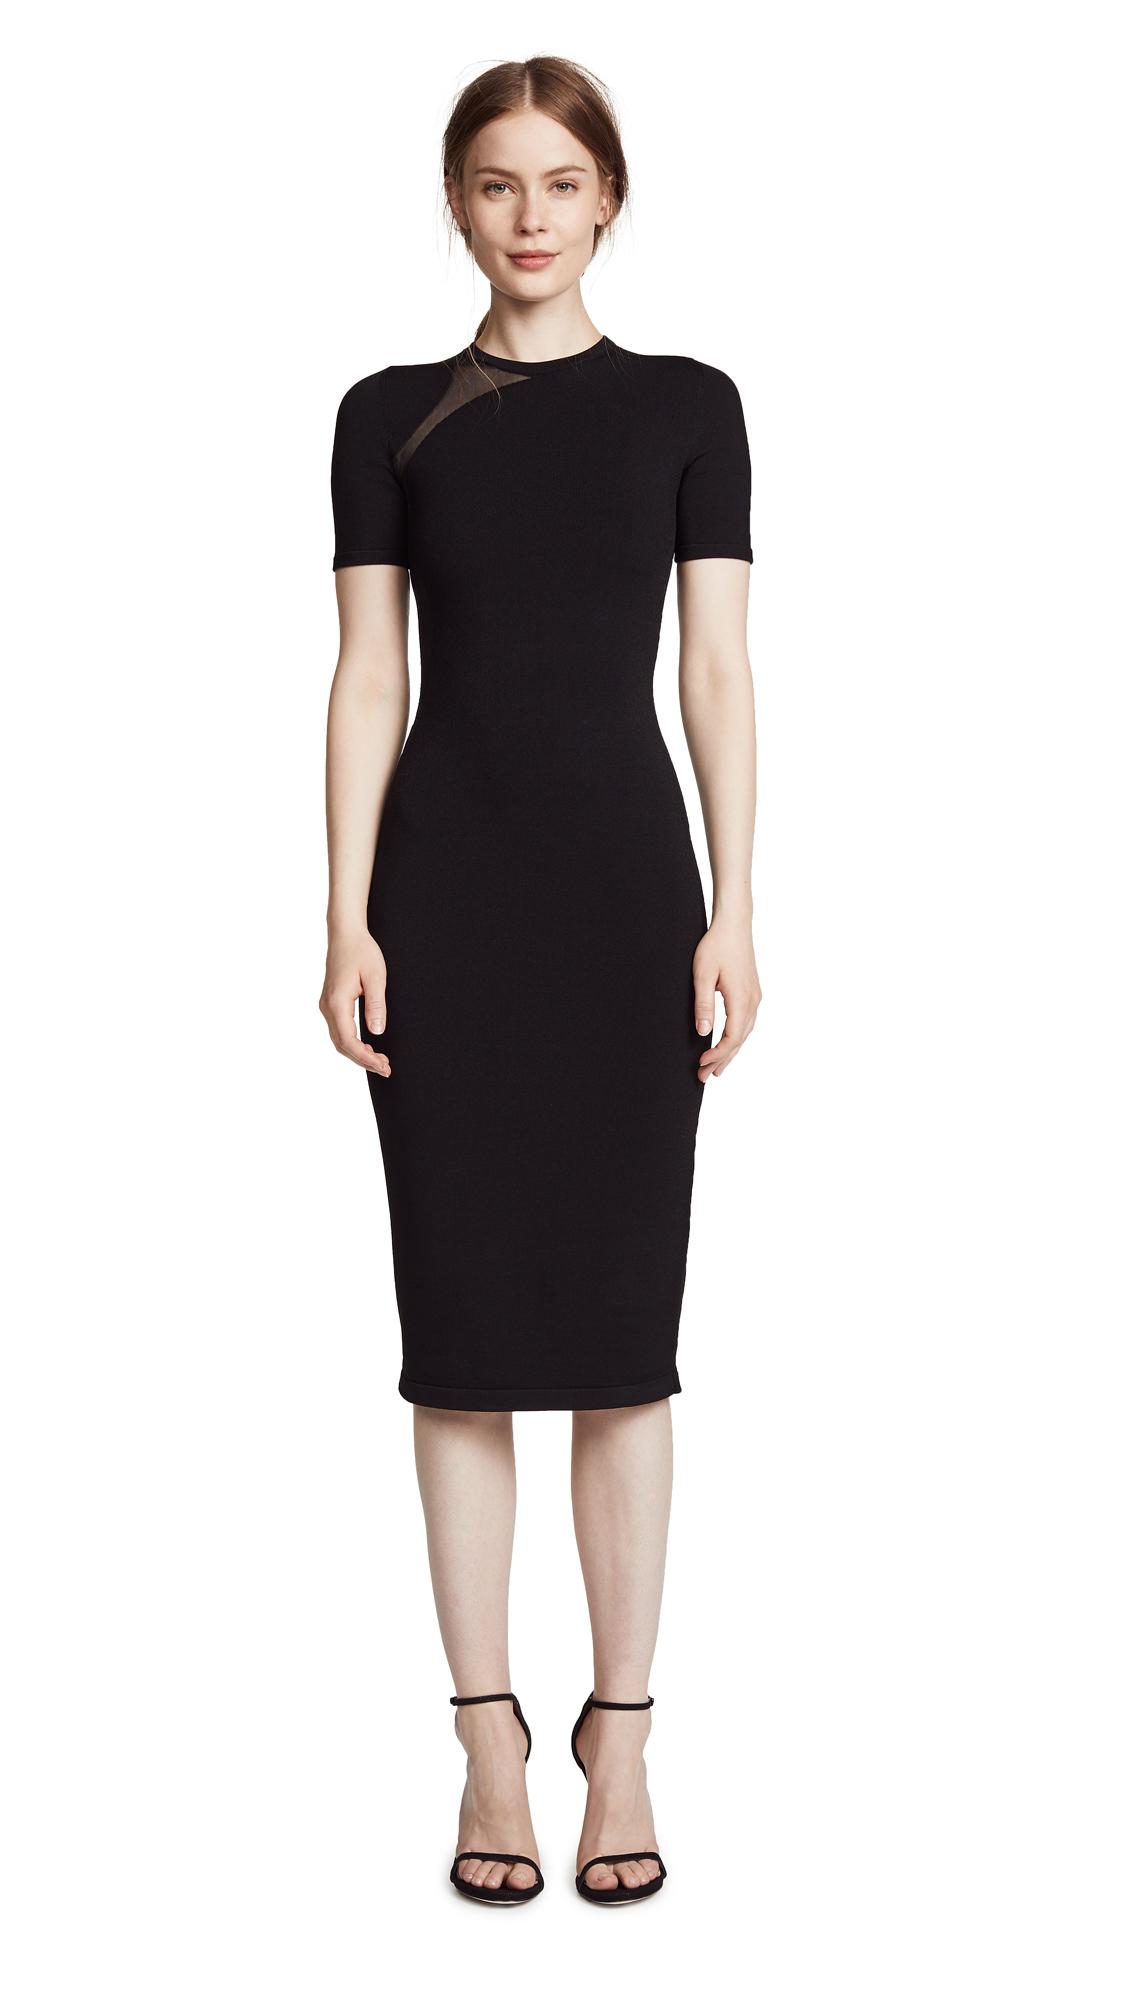 Cushnie Et Ochs Dress with Sheer Cutout In Black